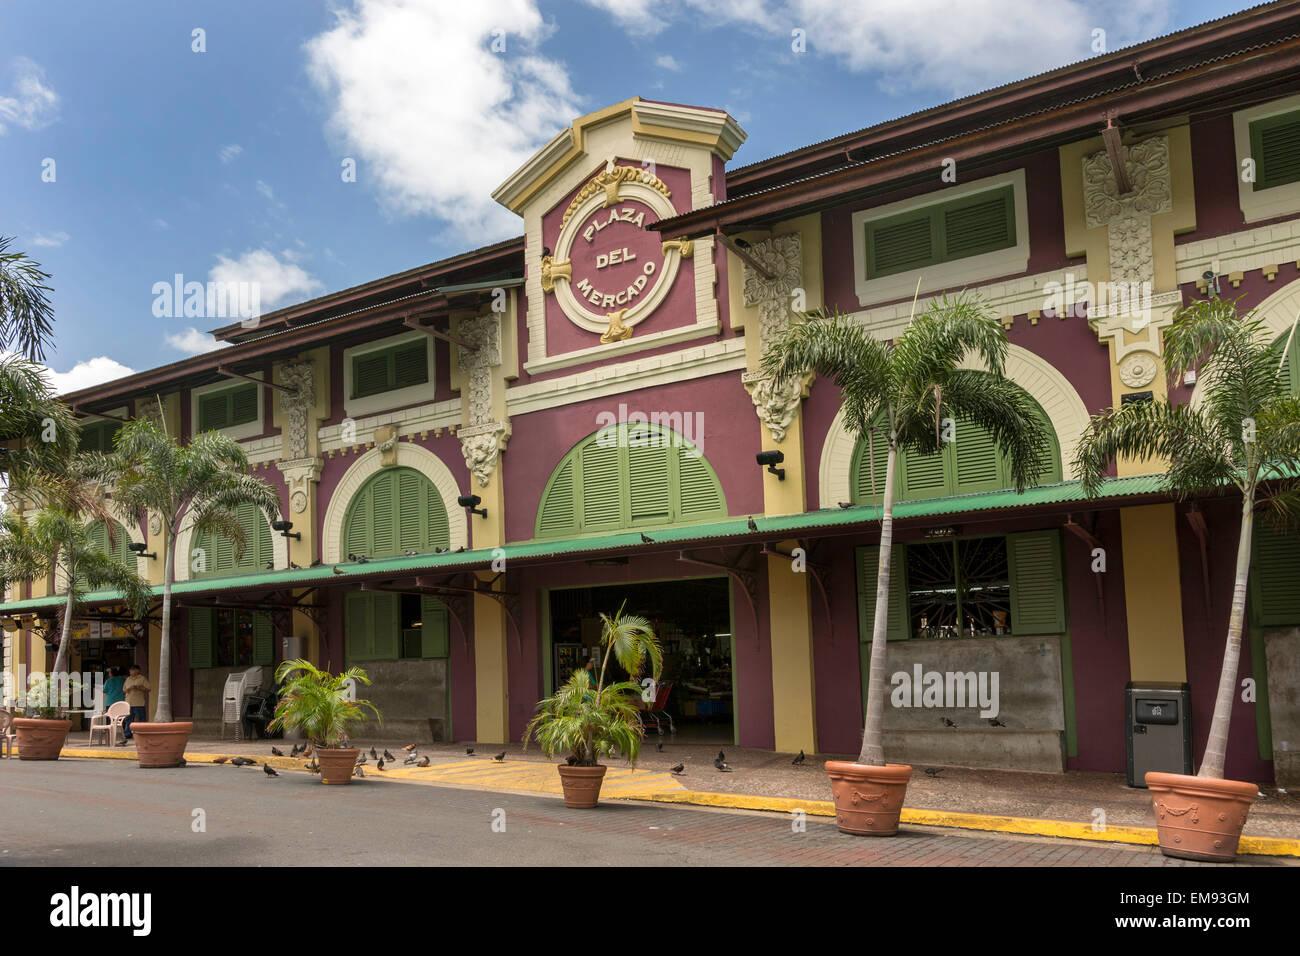 Public market place in Santurce neighborhood. - Stock Image